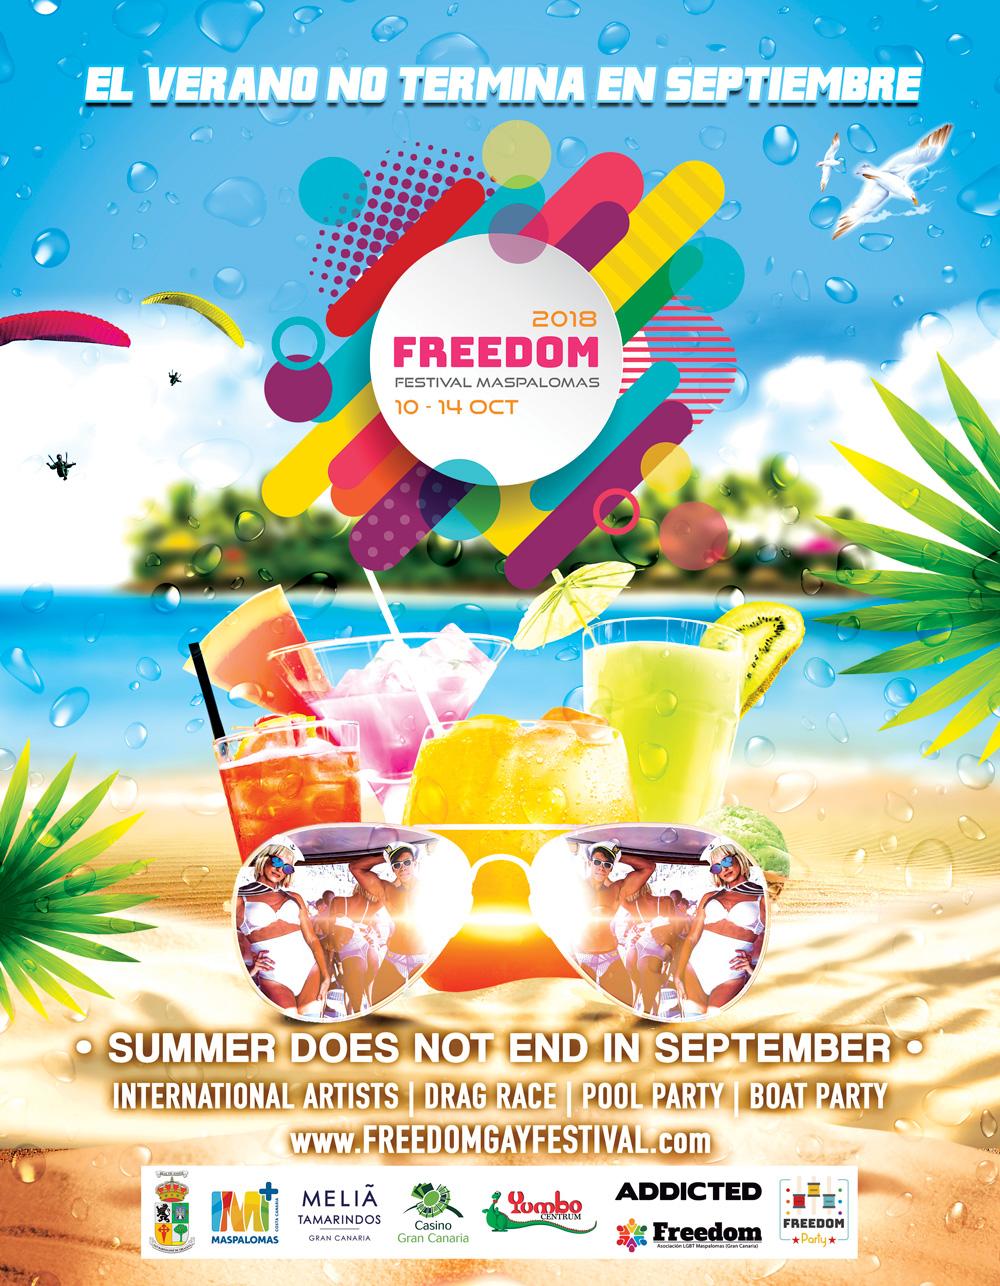 Freedom Festival Maspalomas 2018 ``Official poster``